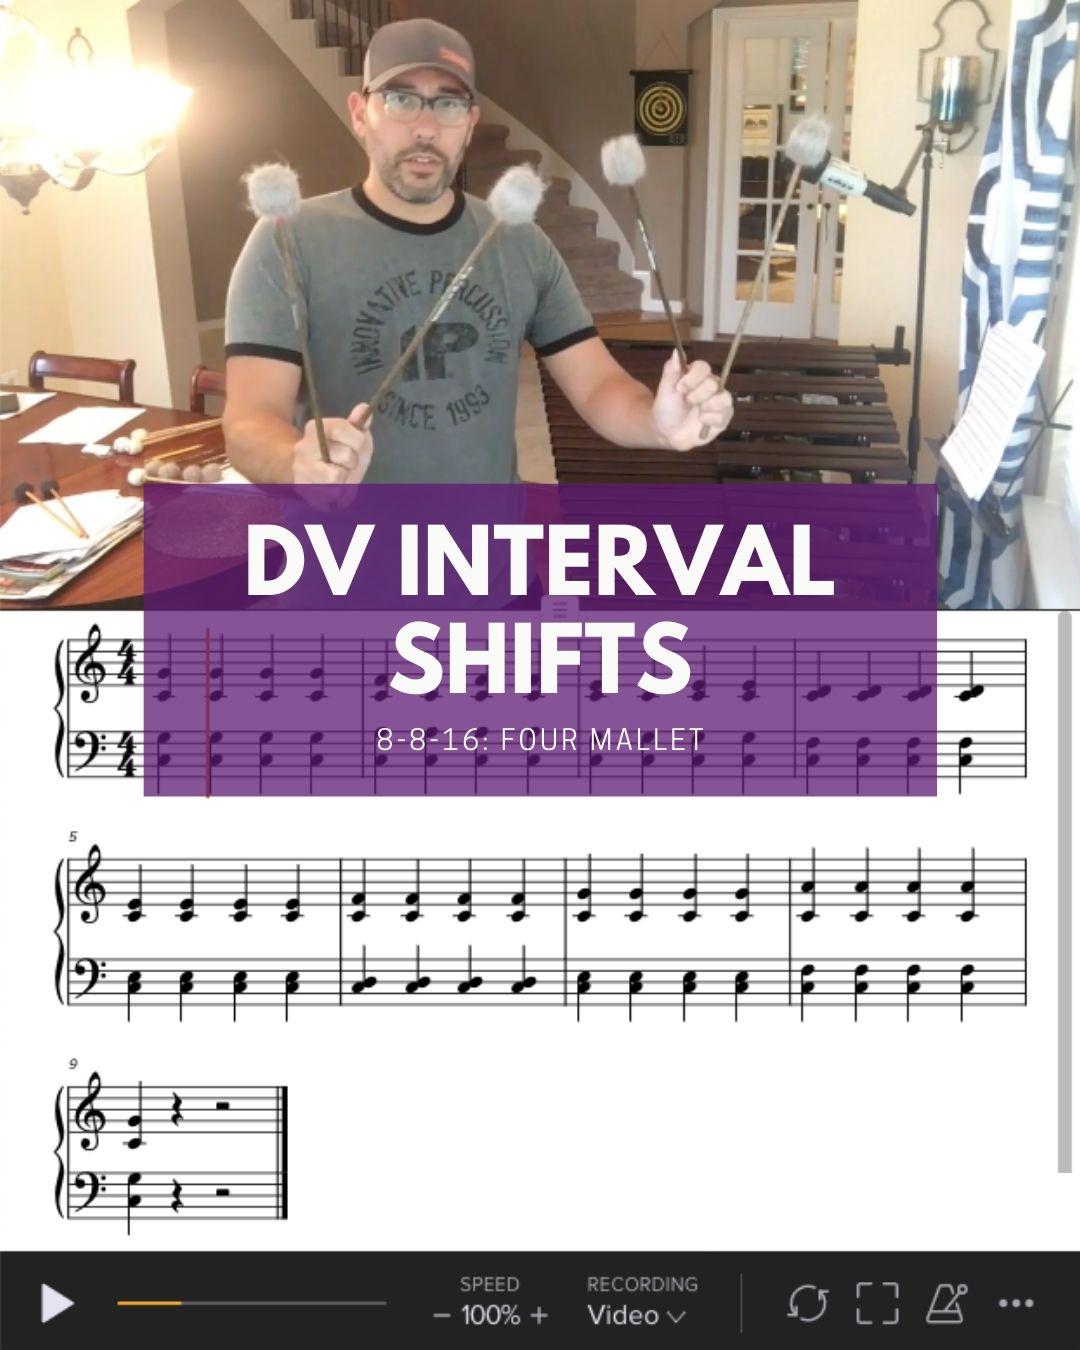 DV Interval Shifts